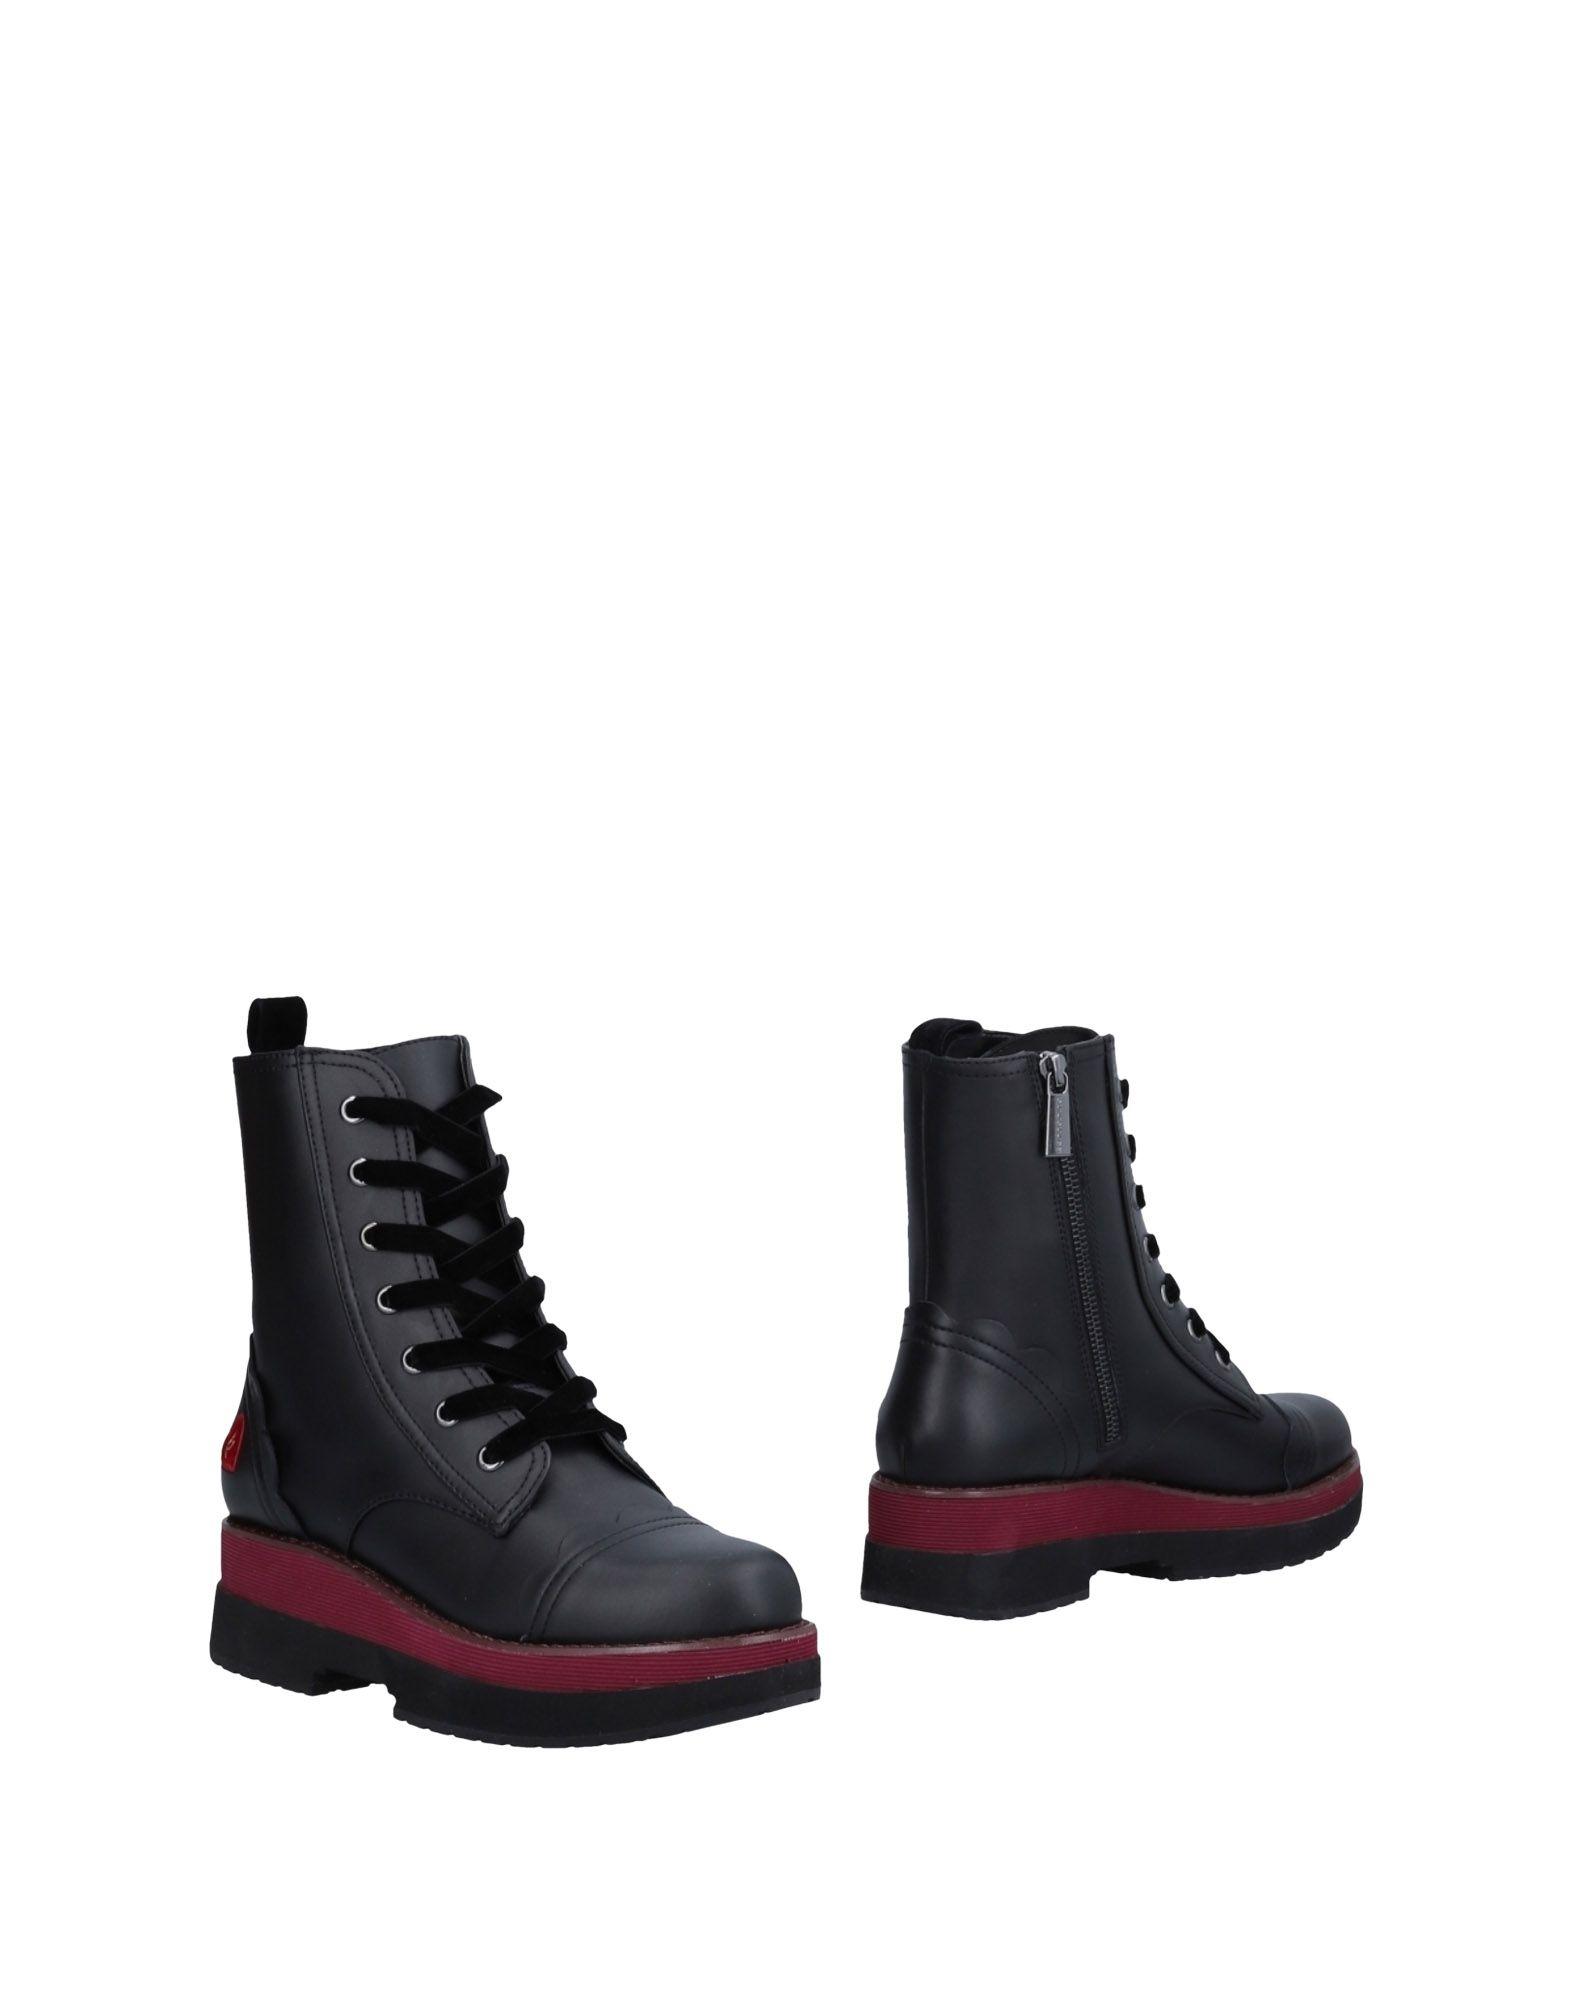 Fornarina Gute Stiefelette Damen  11494070JF Gute Fornarina Qualität beliebte Schuhe 8a8222